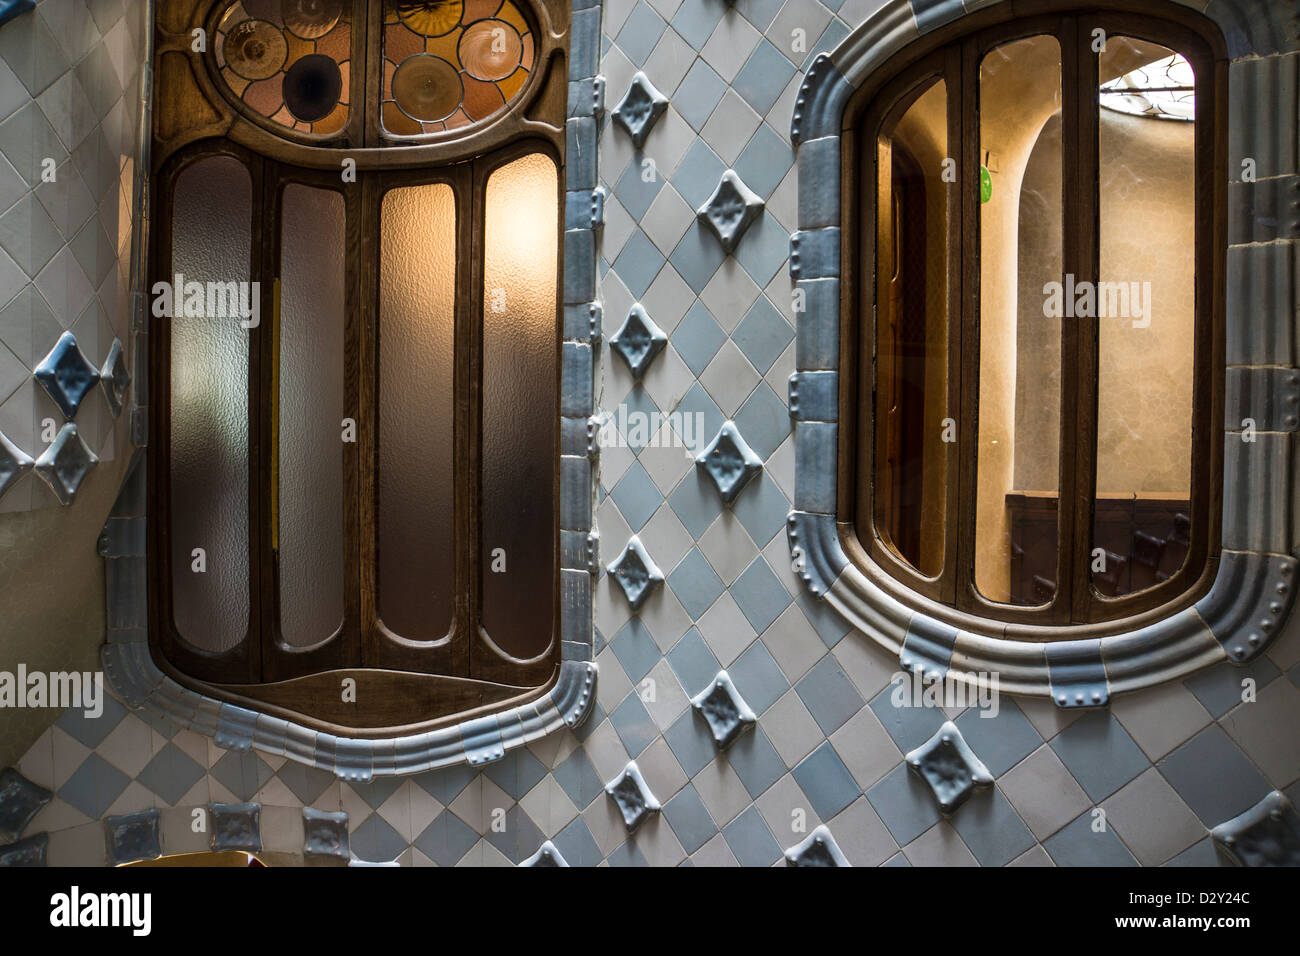 Interior Batllo Stockfotos & Interior Batllo Bilder - Alamy